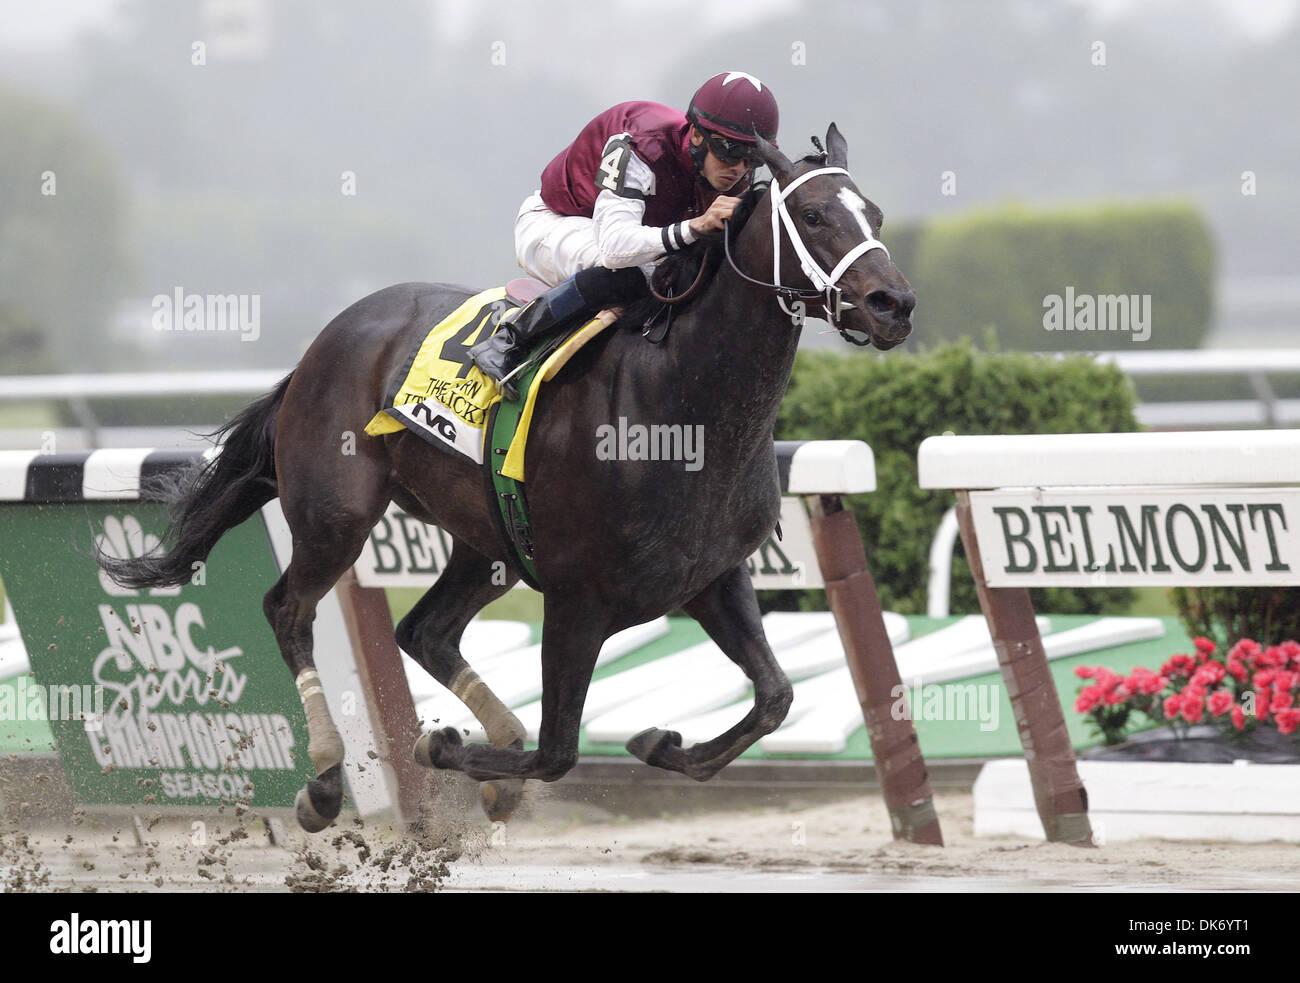 June 11, 2011 - Elmont, NY, U.S. - It's Tricky, Eddie Castro up, wins the Gr. I Acorn Stakes on Belmont Stakes Day. Trainer is Kiaran McLaughlin Belmont Park, June 10, 2011. (Credit Image: © Joan Fairman Kanes/Eclipse/ZUMAPRESS.com) - Stock Image